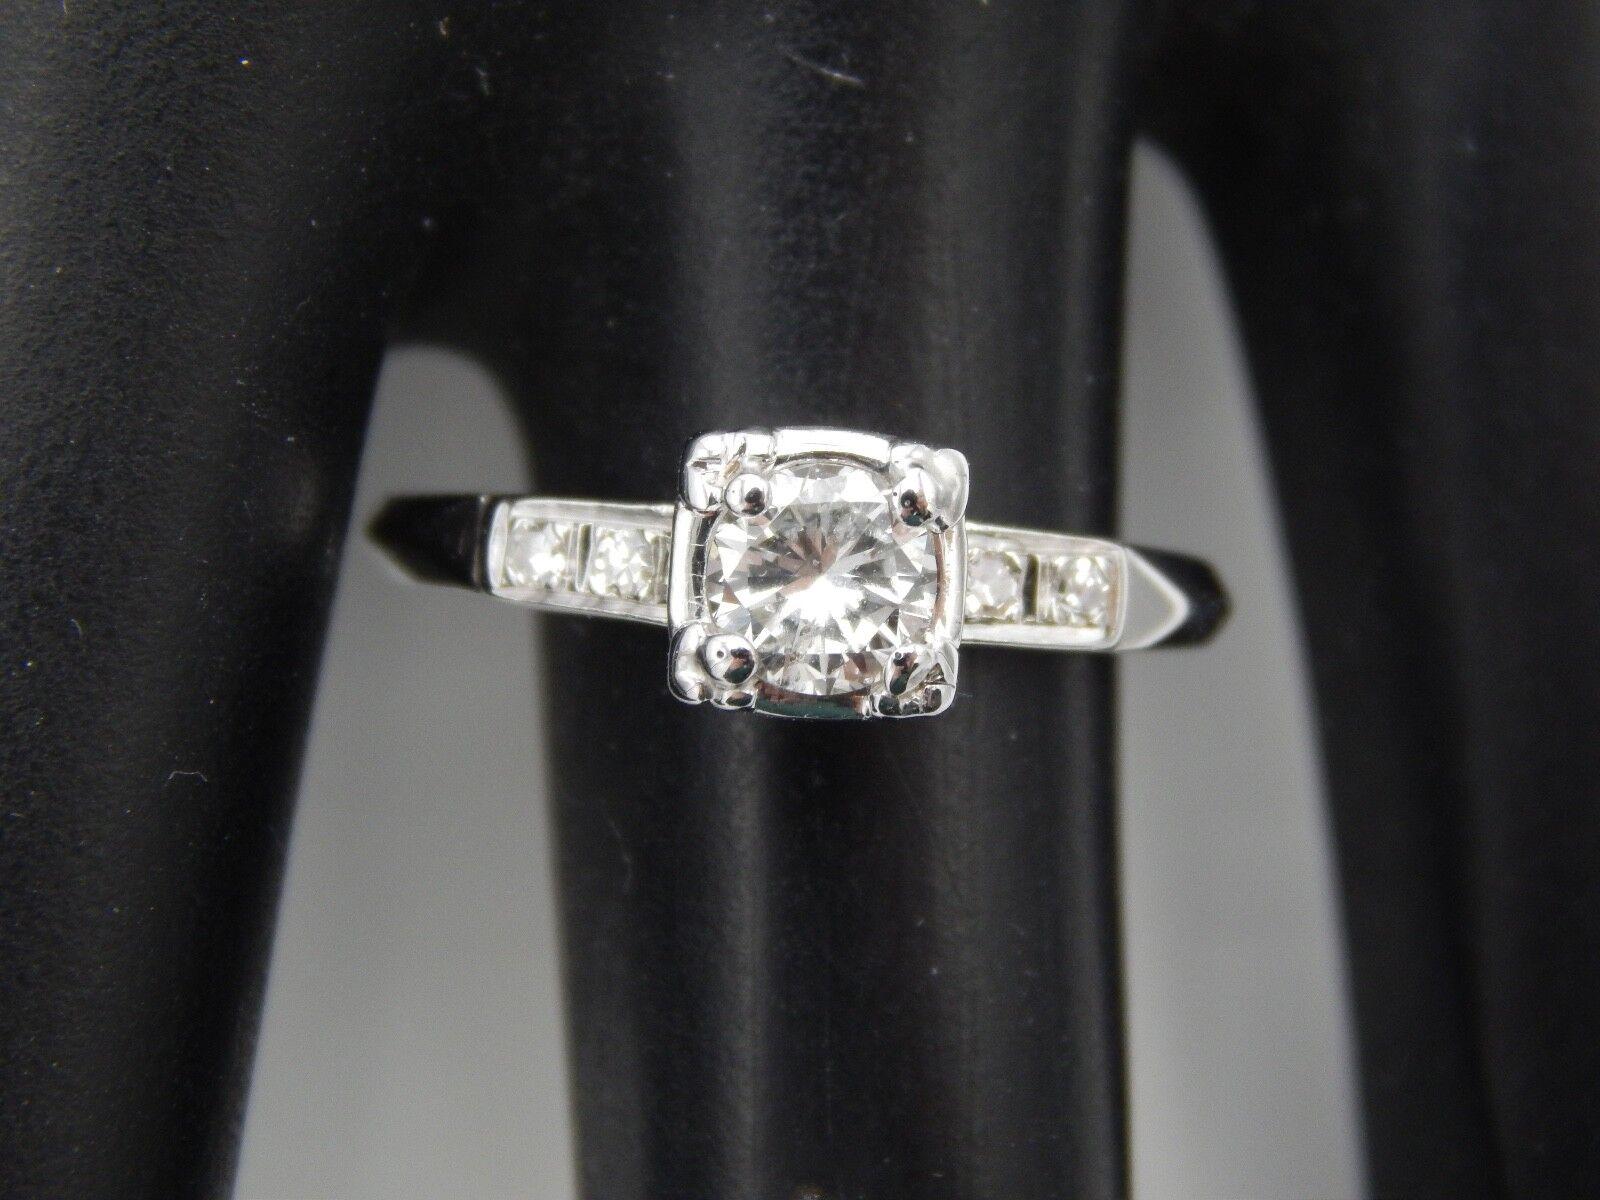 14k WG .50 tcw Art Deco Diamond Engagement Ring G SI1 Transitional Cut Estate